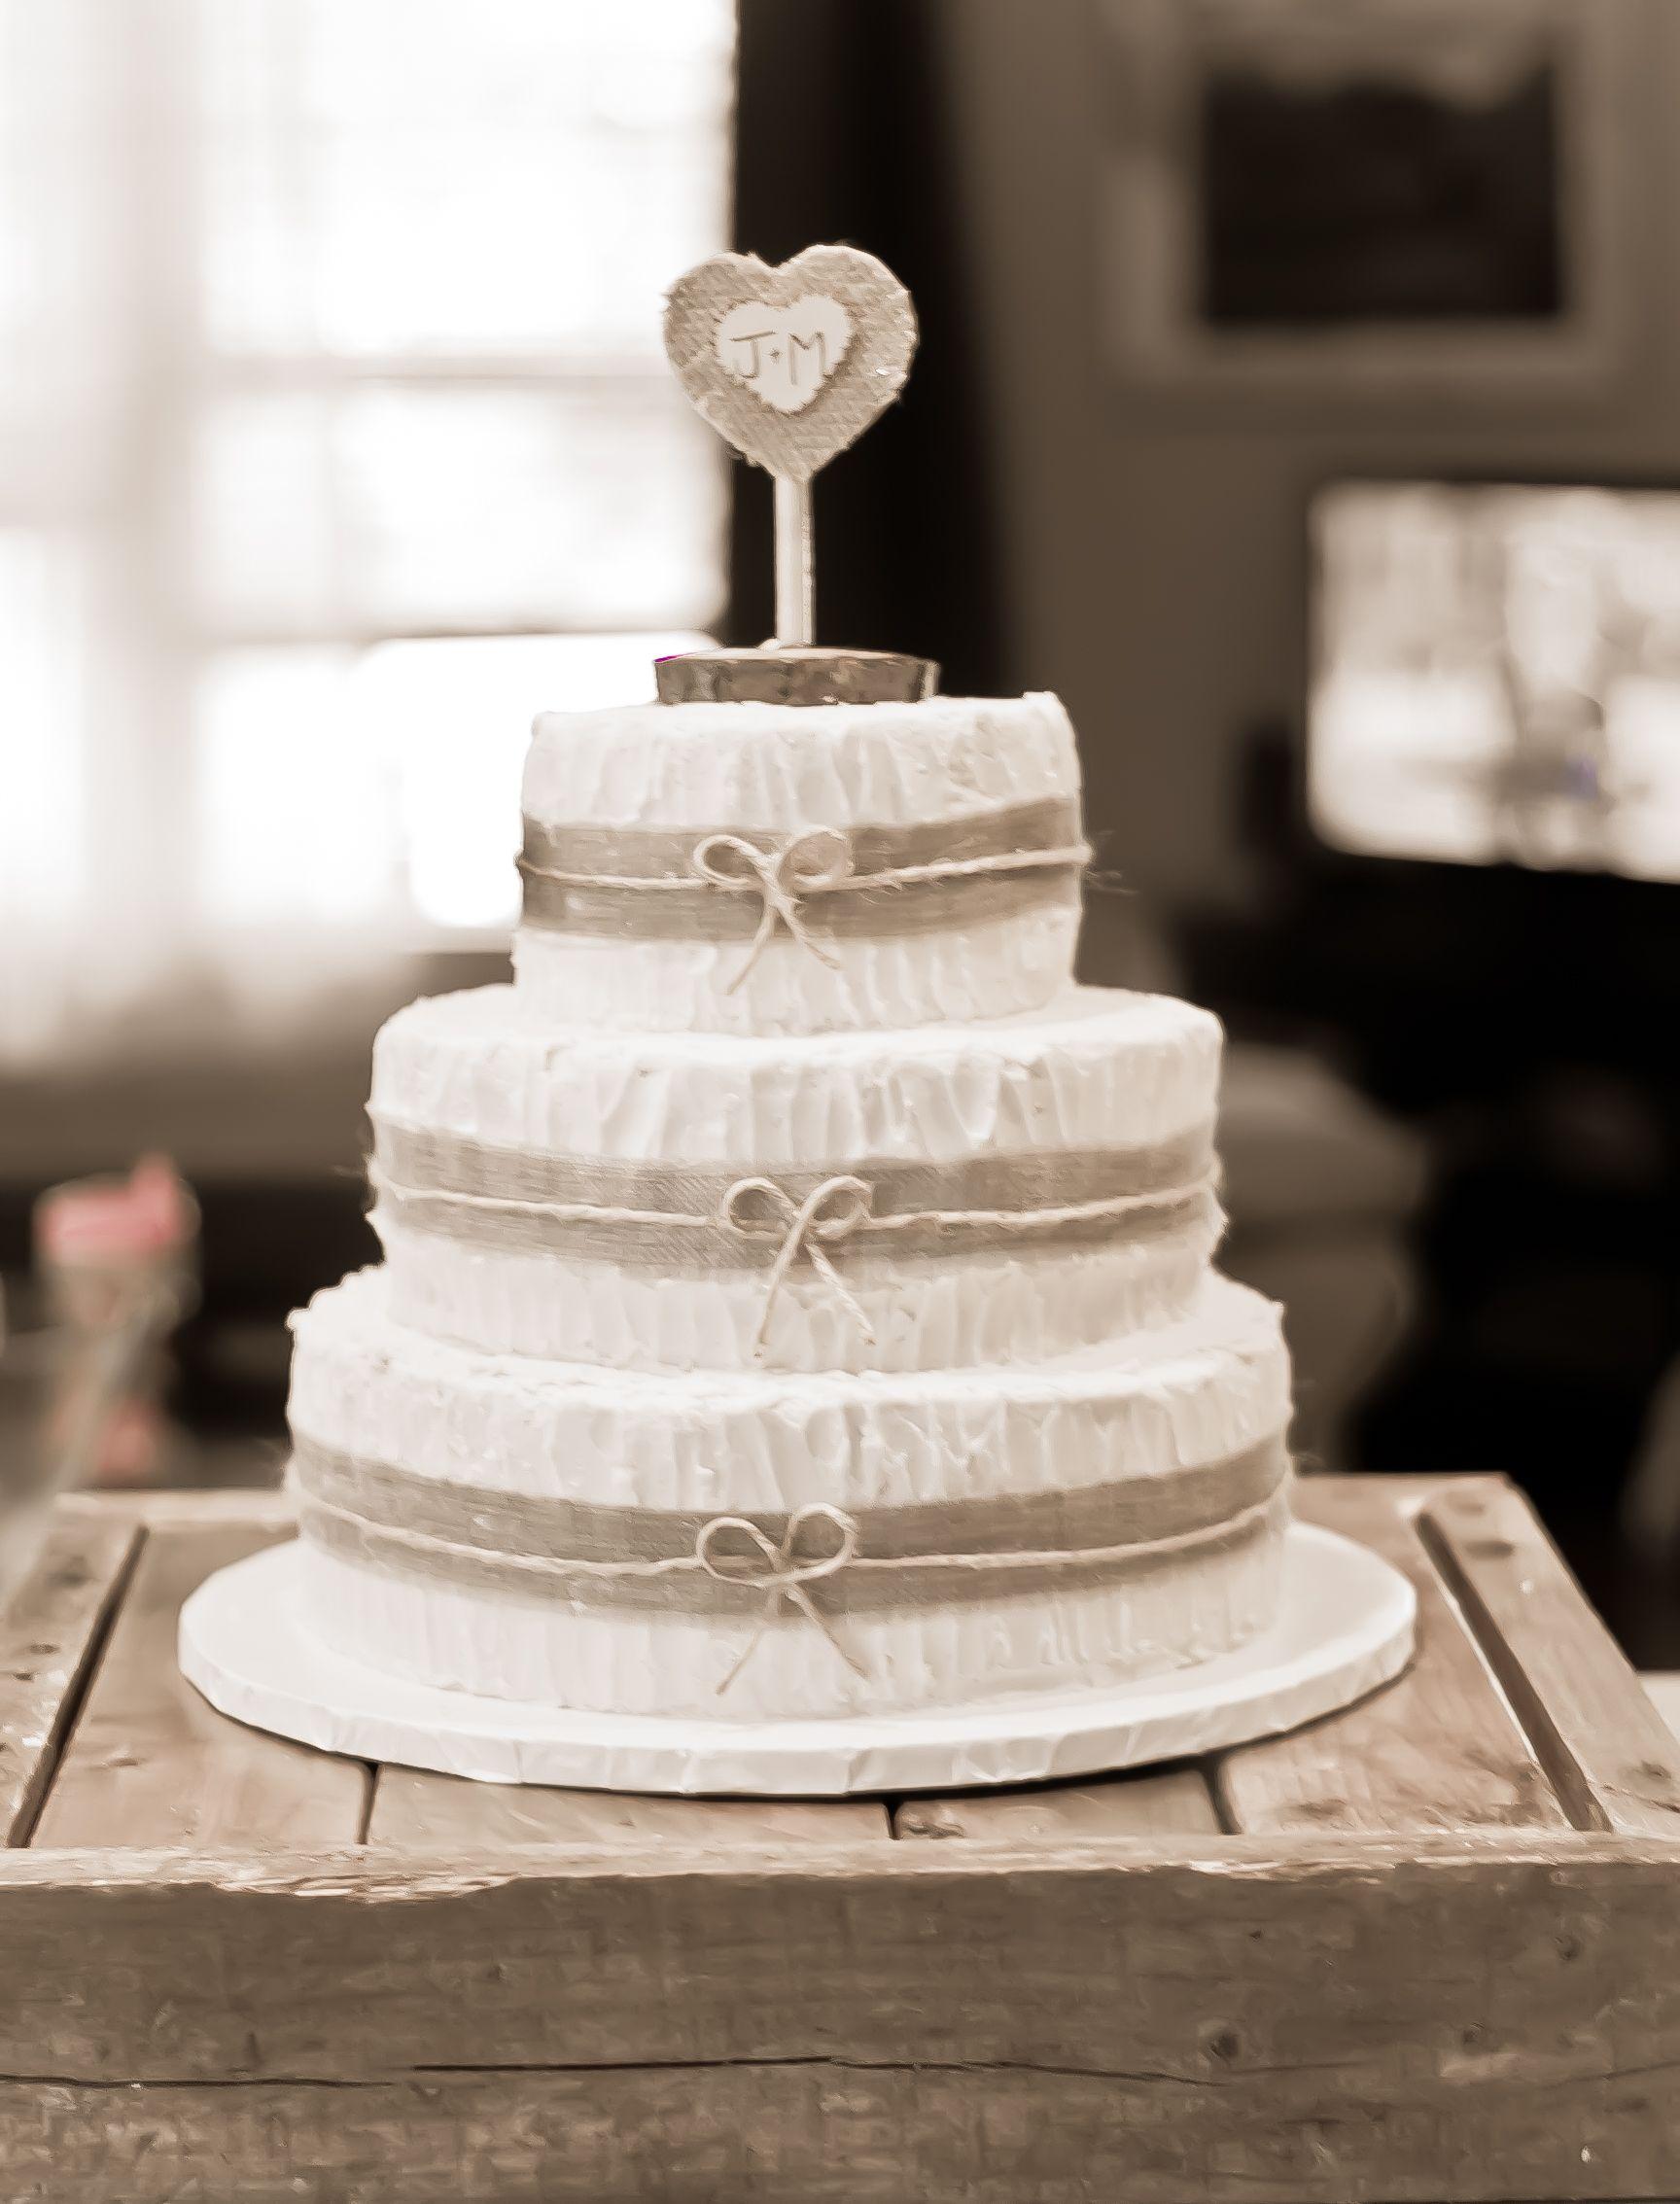 pin rustic wedding cake topper ivory burlap bunting just cake on pinterest. Black Bedroom Furniture Sets. Home Design Ideas